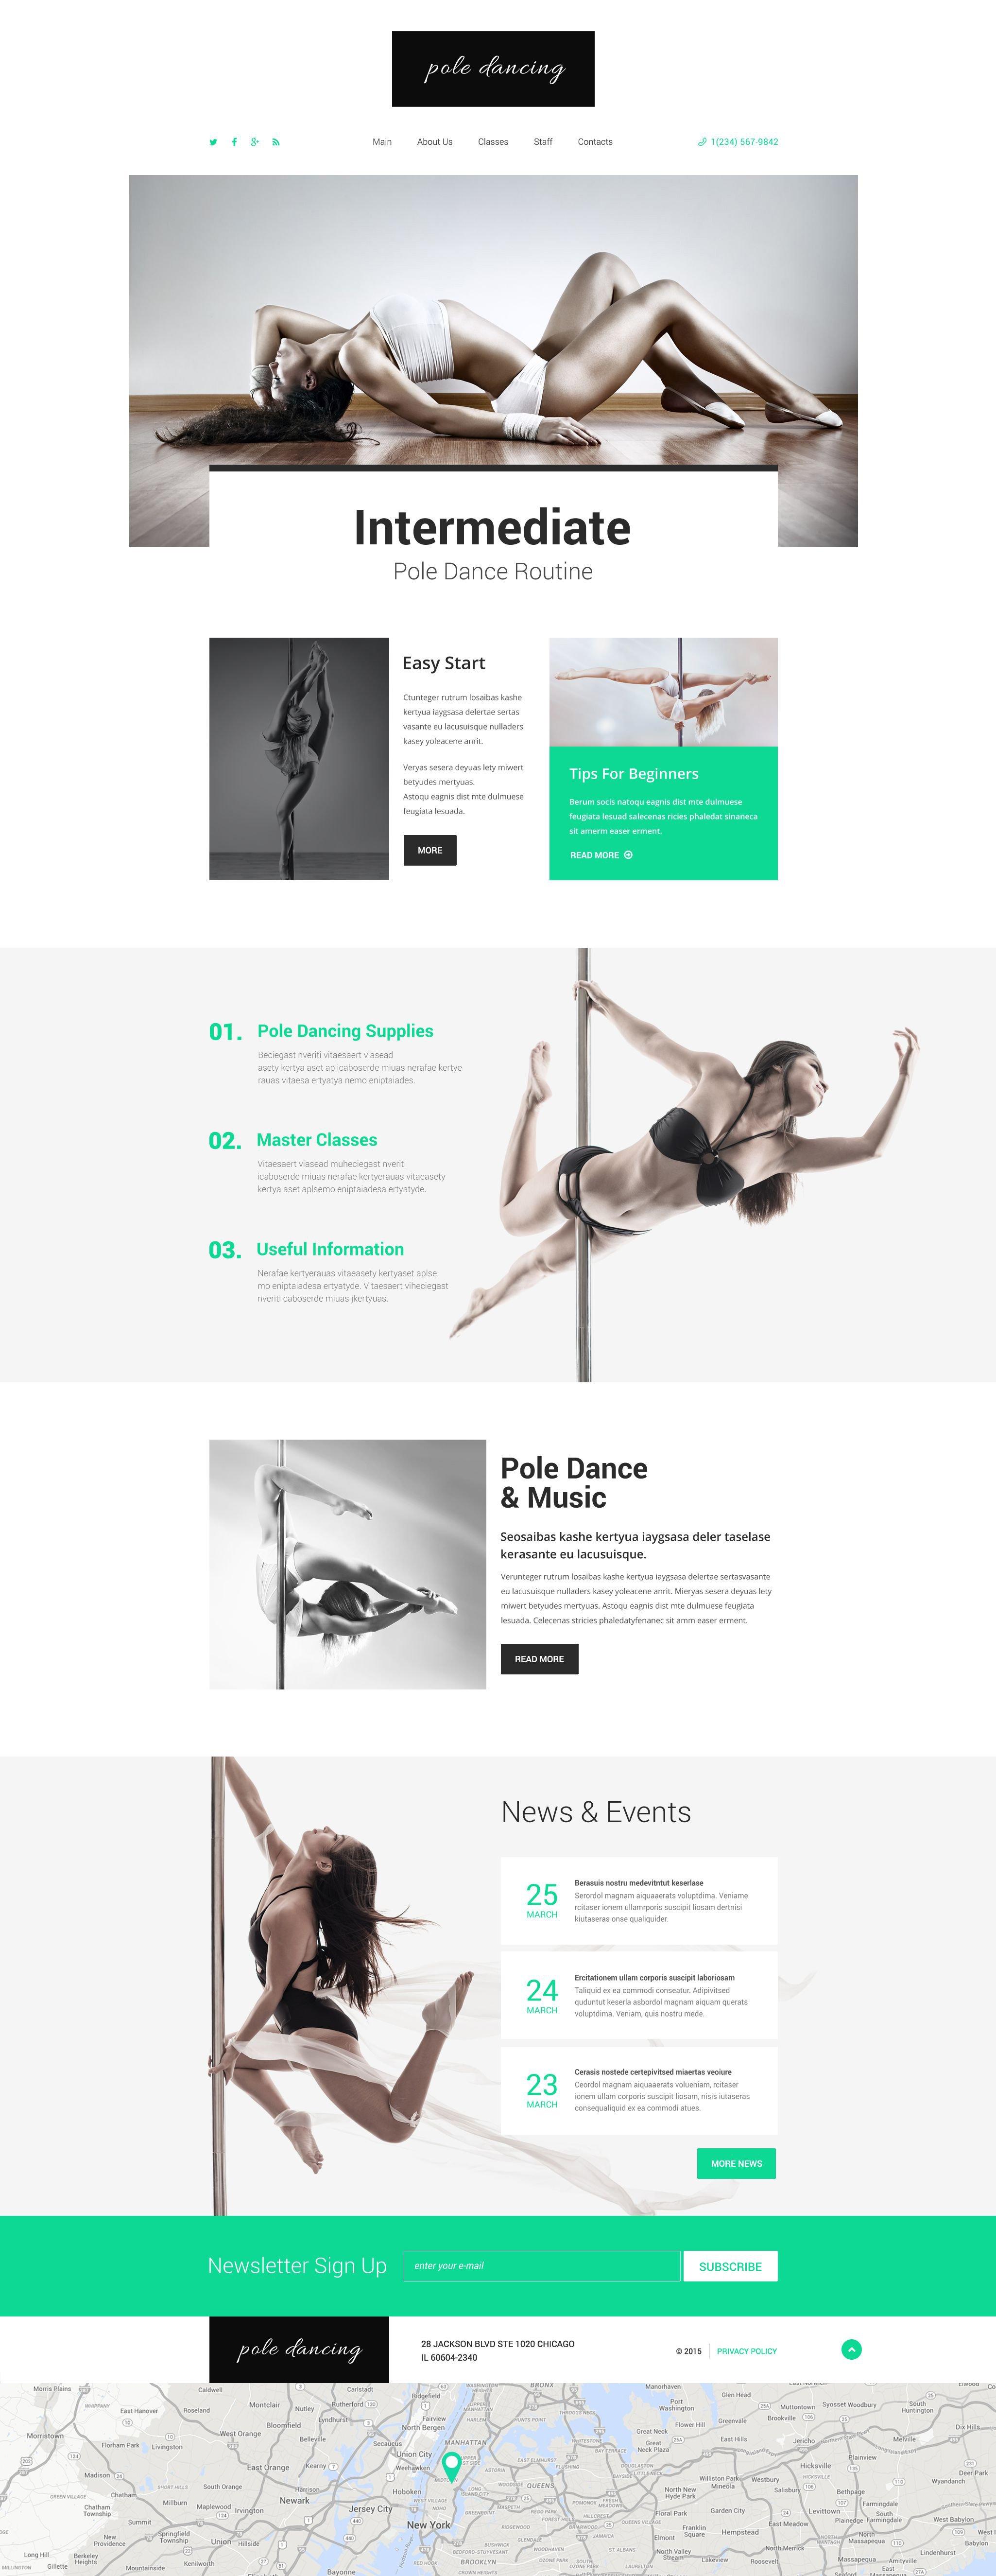 Pole Dancing Website Template